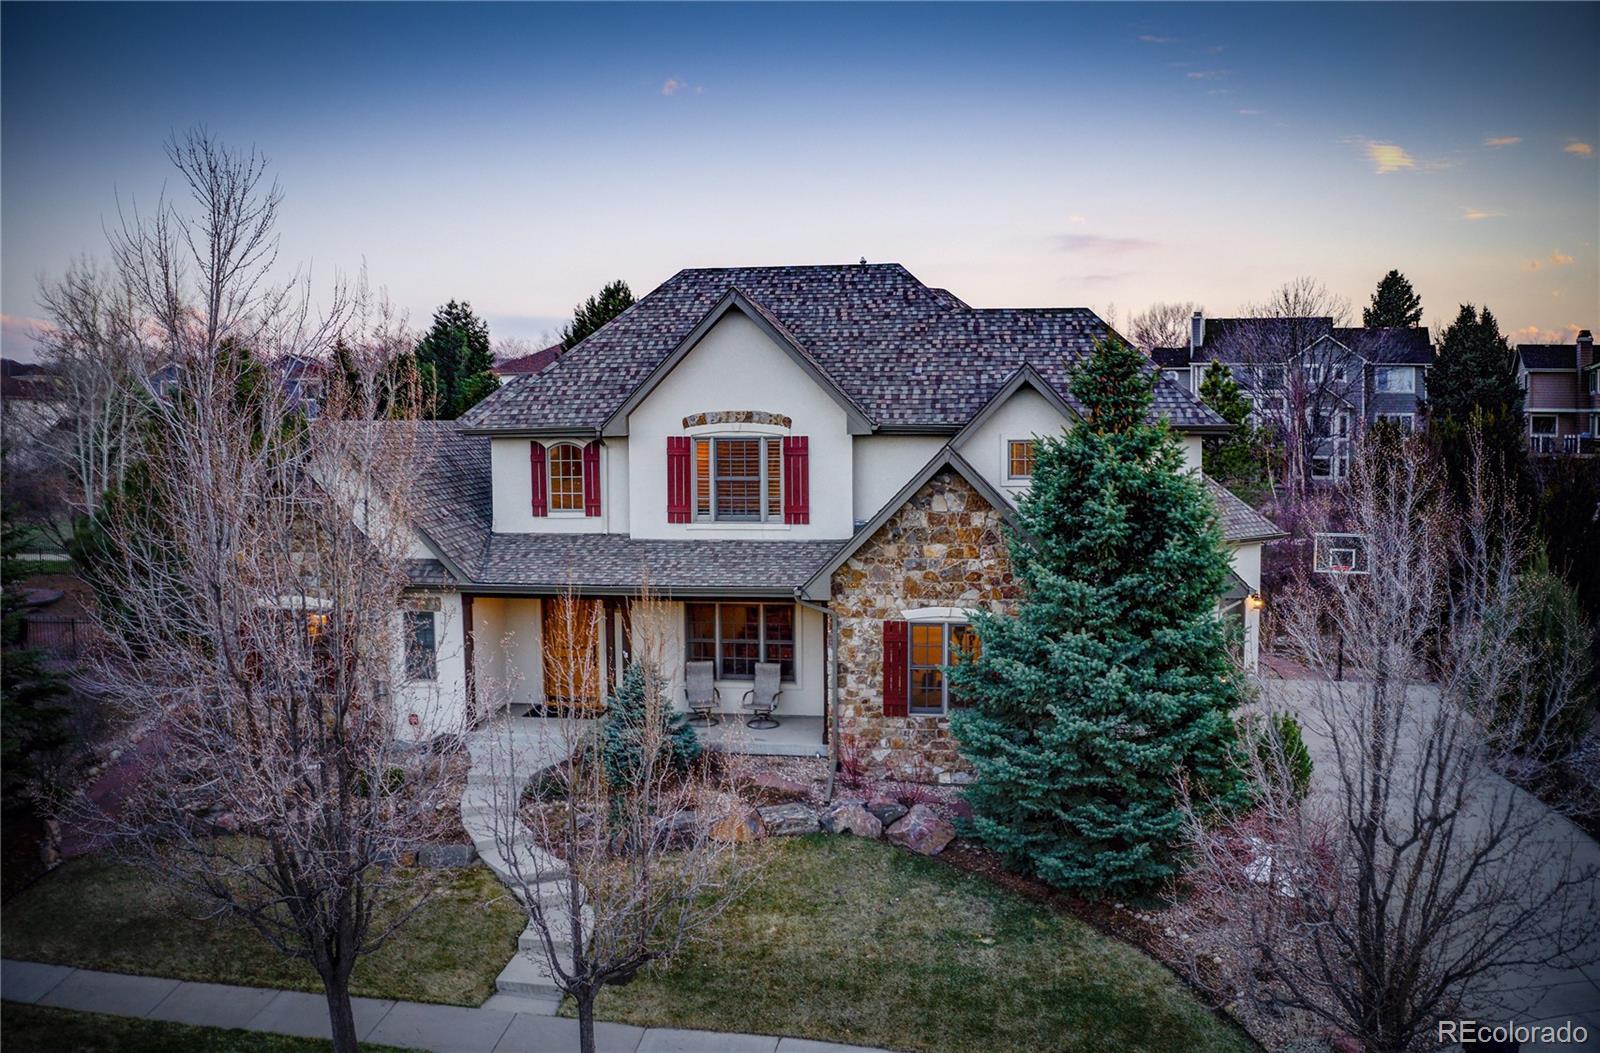 13935 Gunnison Way, Broomfield, CO 80020 - Broomfield, CO real estate listing